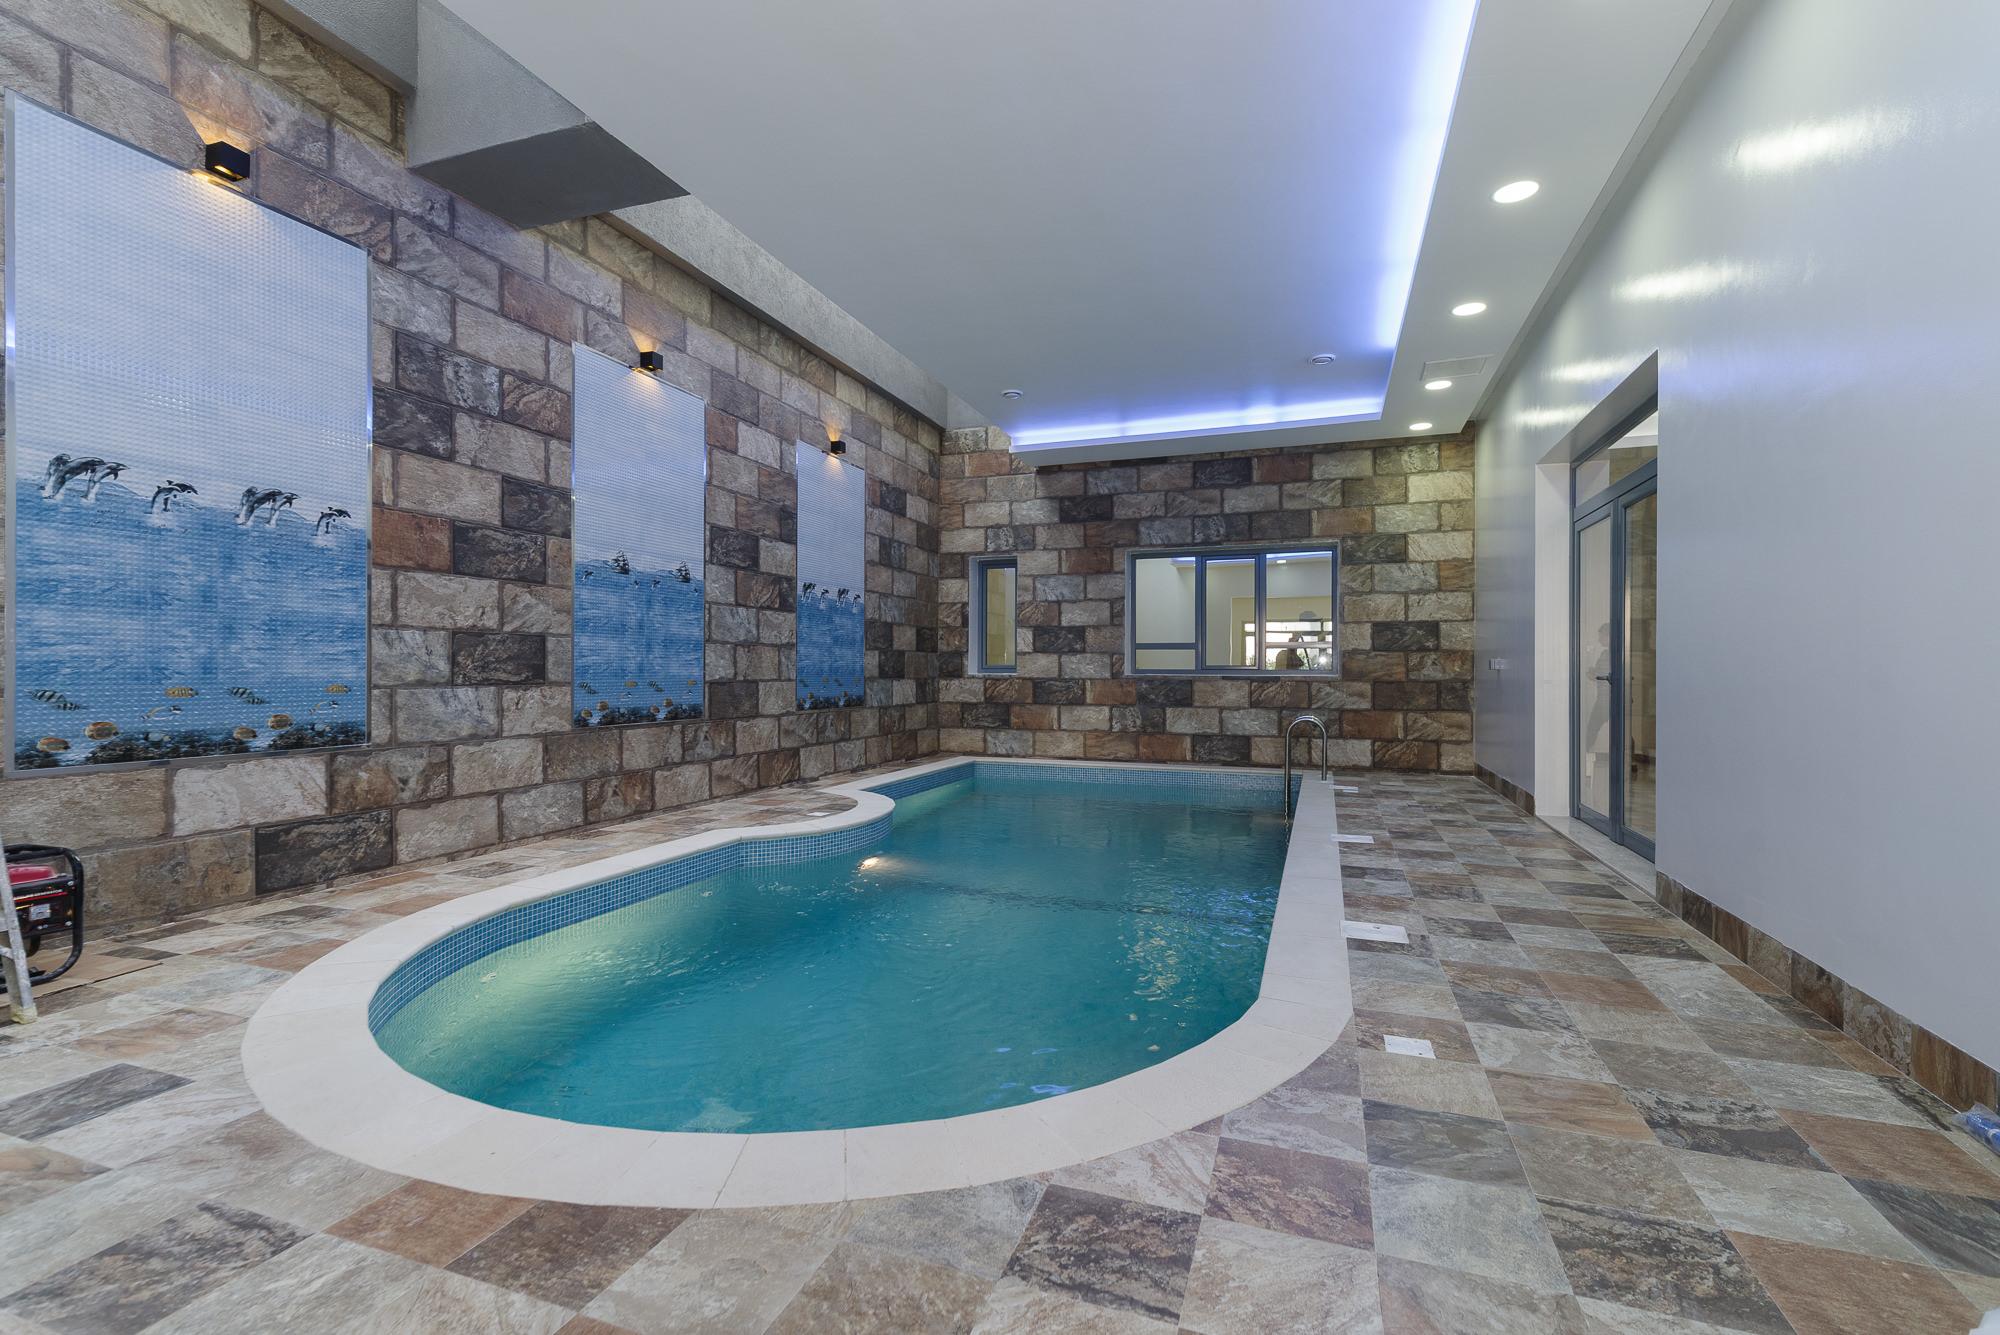 Masayel – unfurnished, three bedroom ground floor w/pool and garden